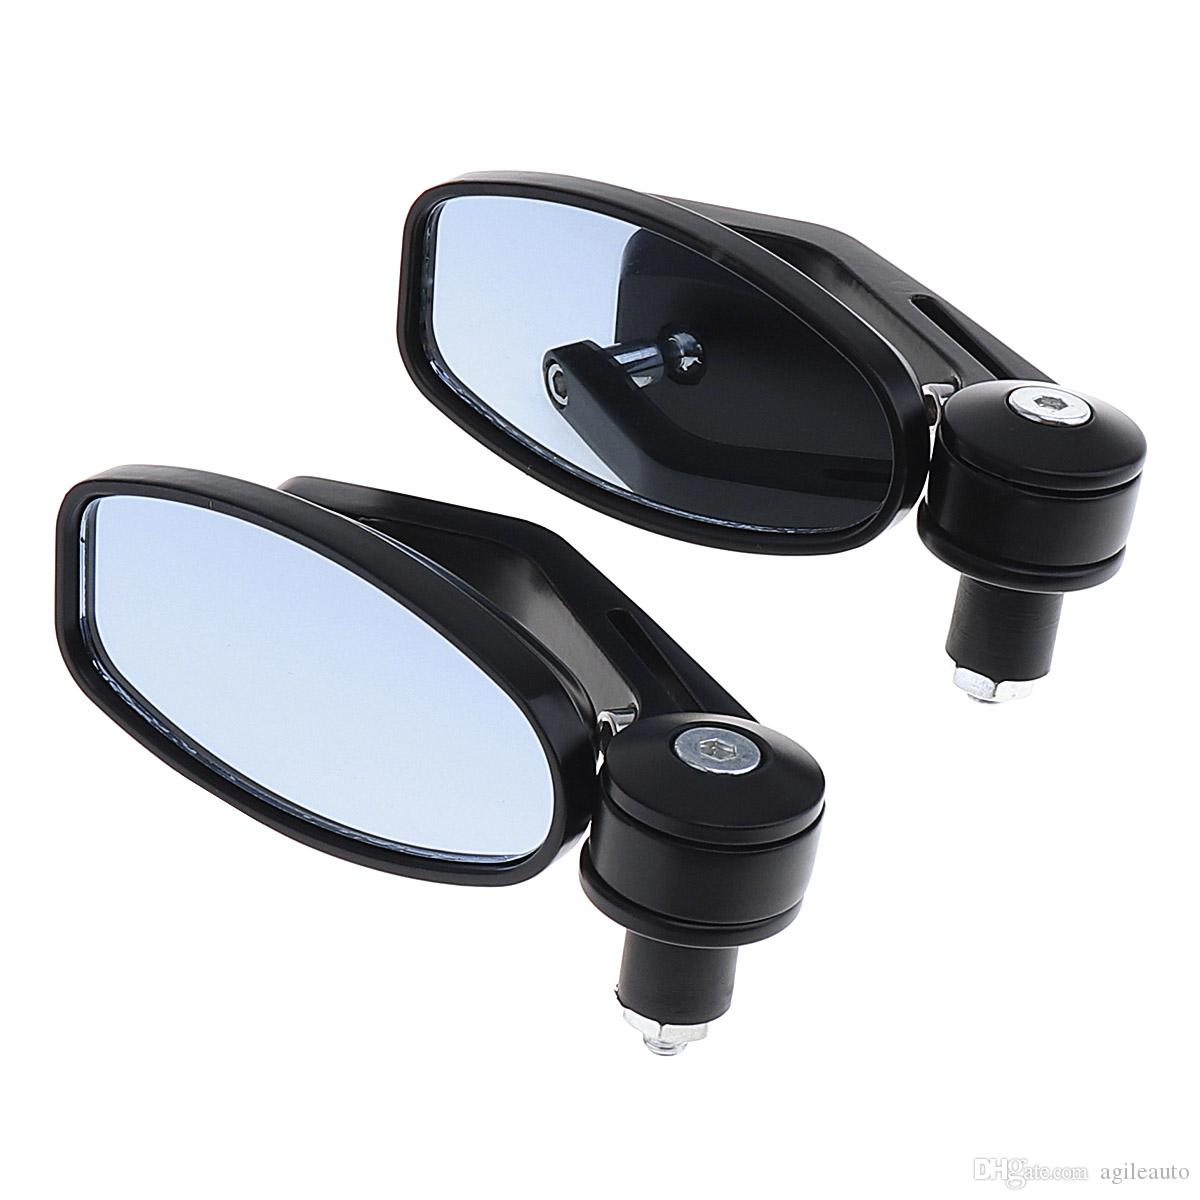 2PCS 22MM تعديل جميع الألومنيوم الكرز 219 العالمي للدراجات النارية مرآة الرؤية الخلفية المرايا الجانبية للدراجات النارية MFF_20E